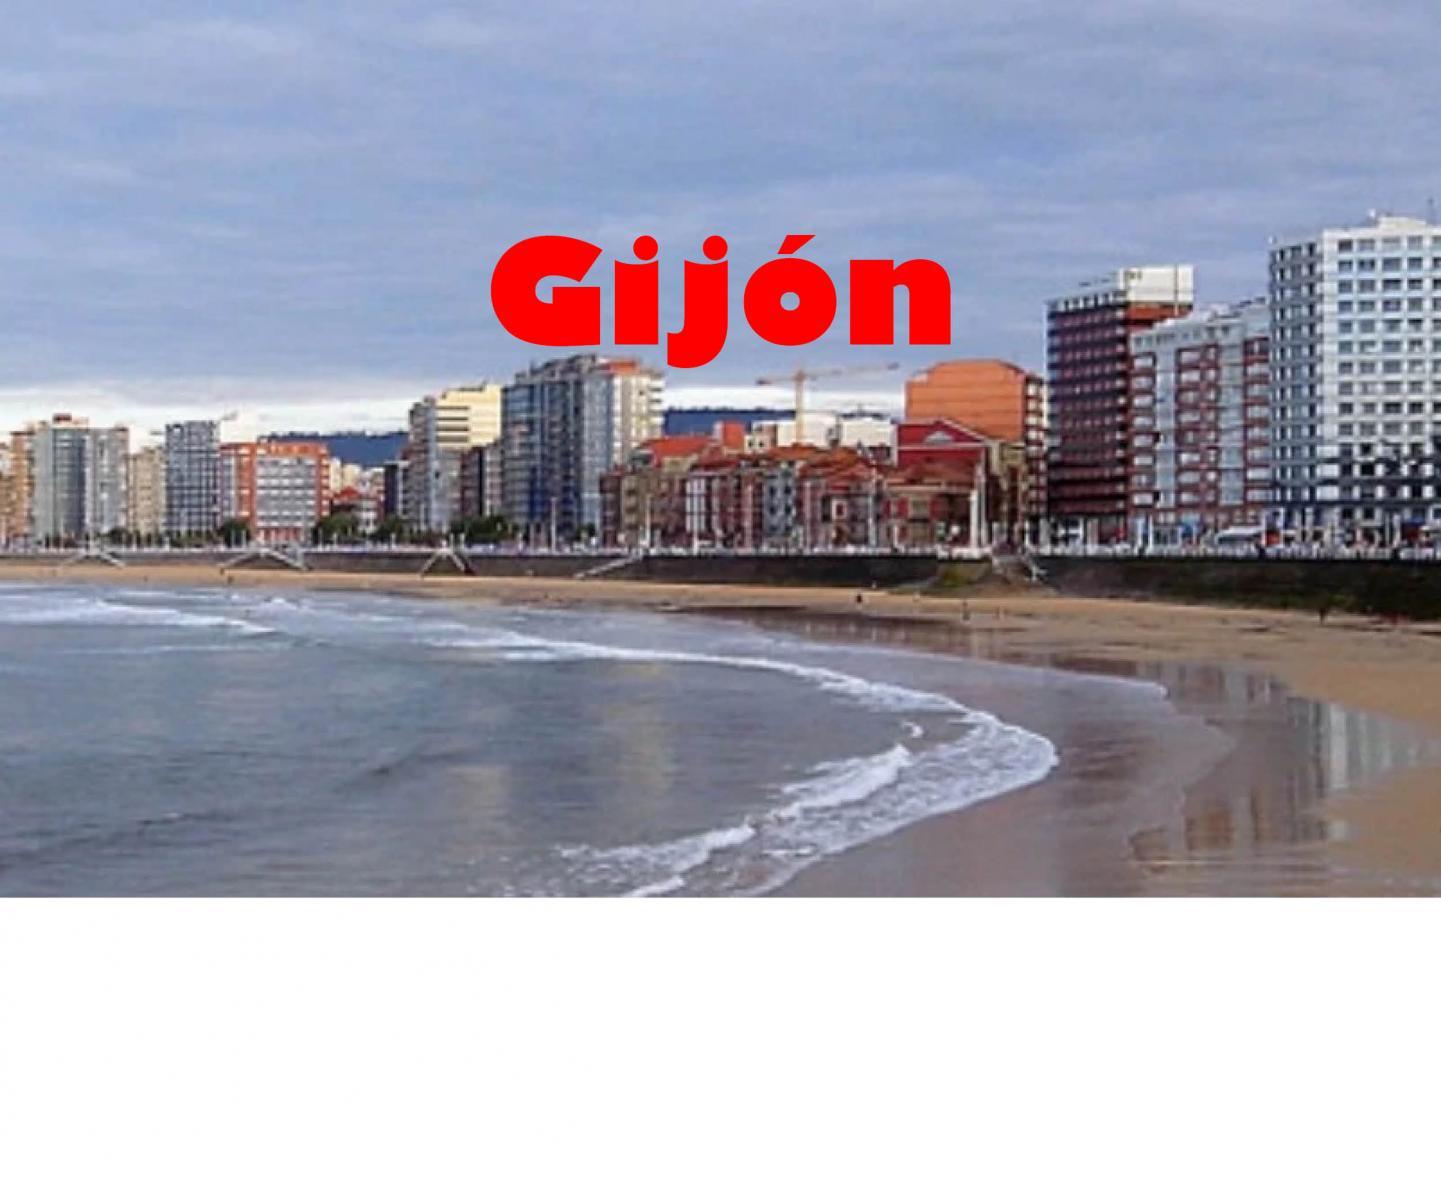 UN DIA DE PLAYA: GIJÓN # 12 DE JULIO# TRANSPORTE I/V + DESAYUNO